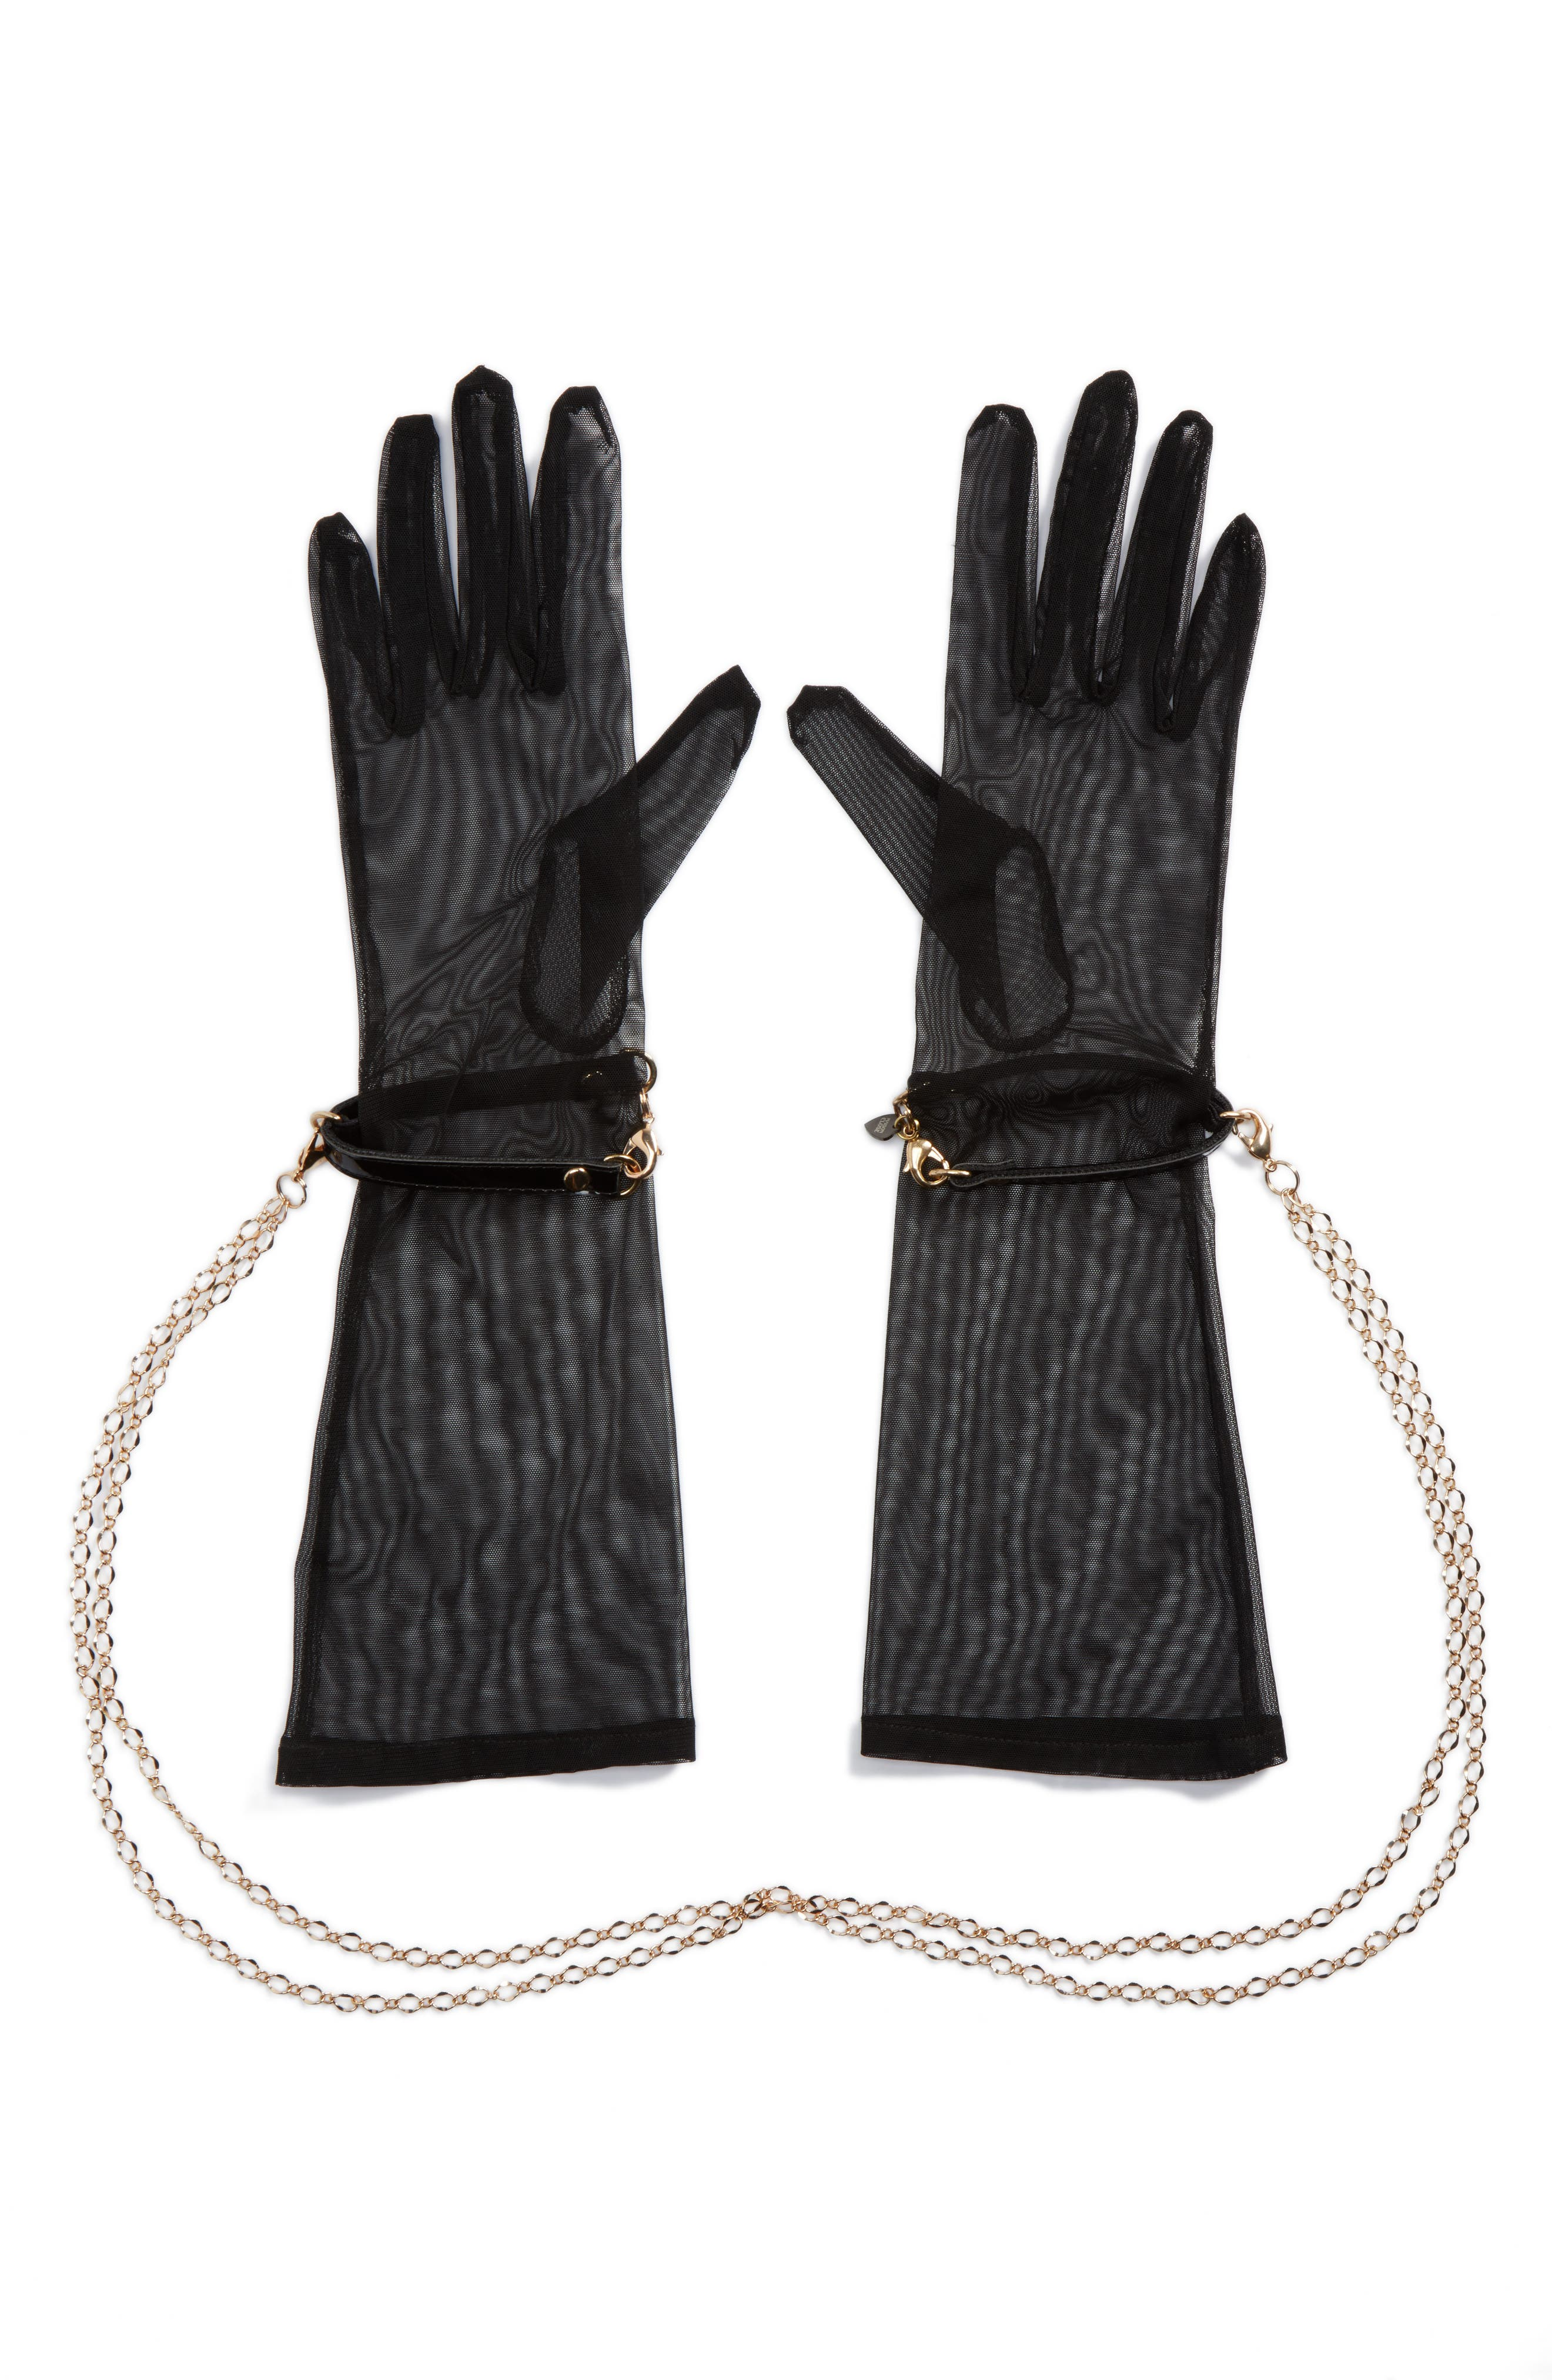 x Fräulein Kink Sheer Gloves,                         Main,                         color, 001